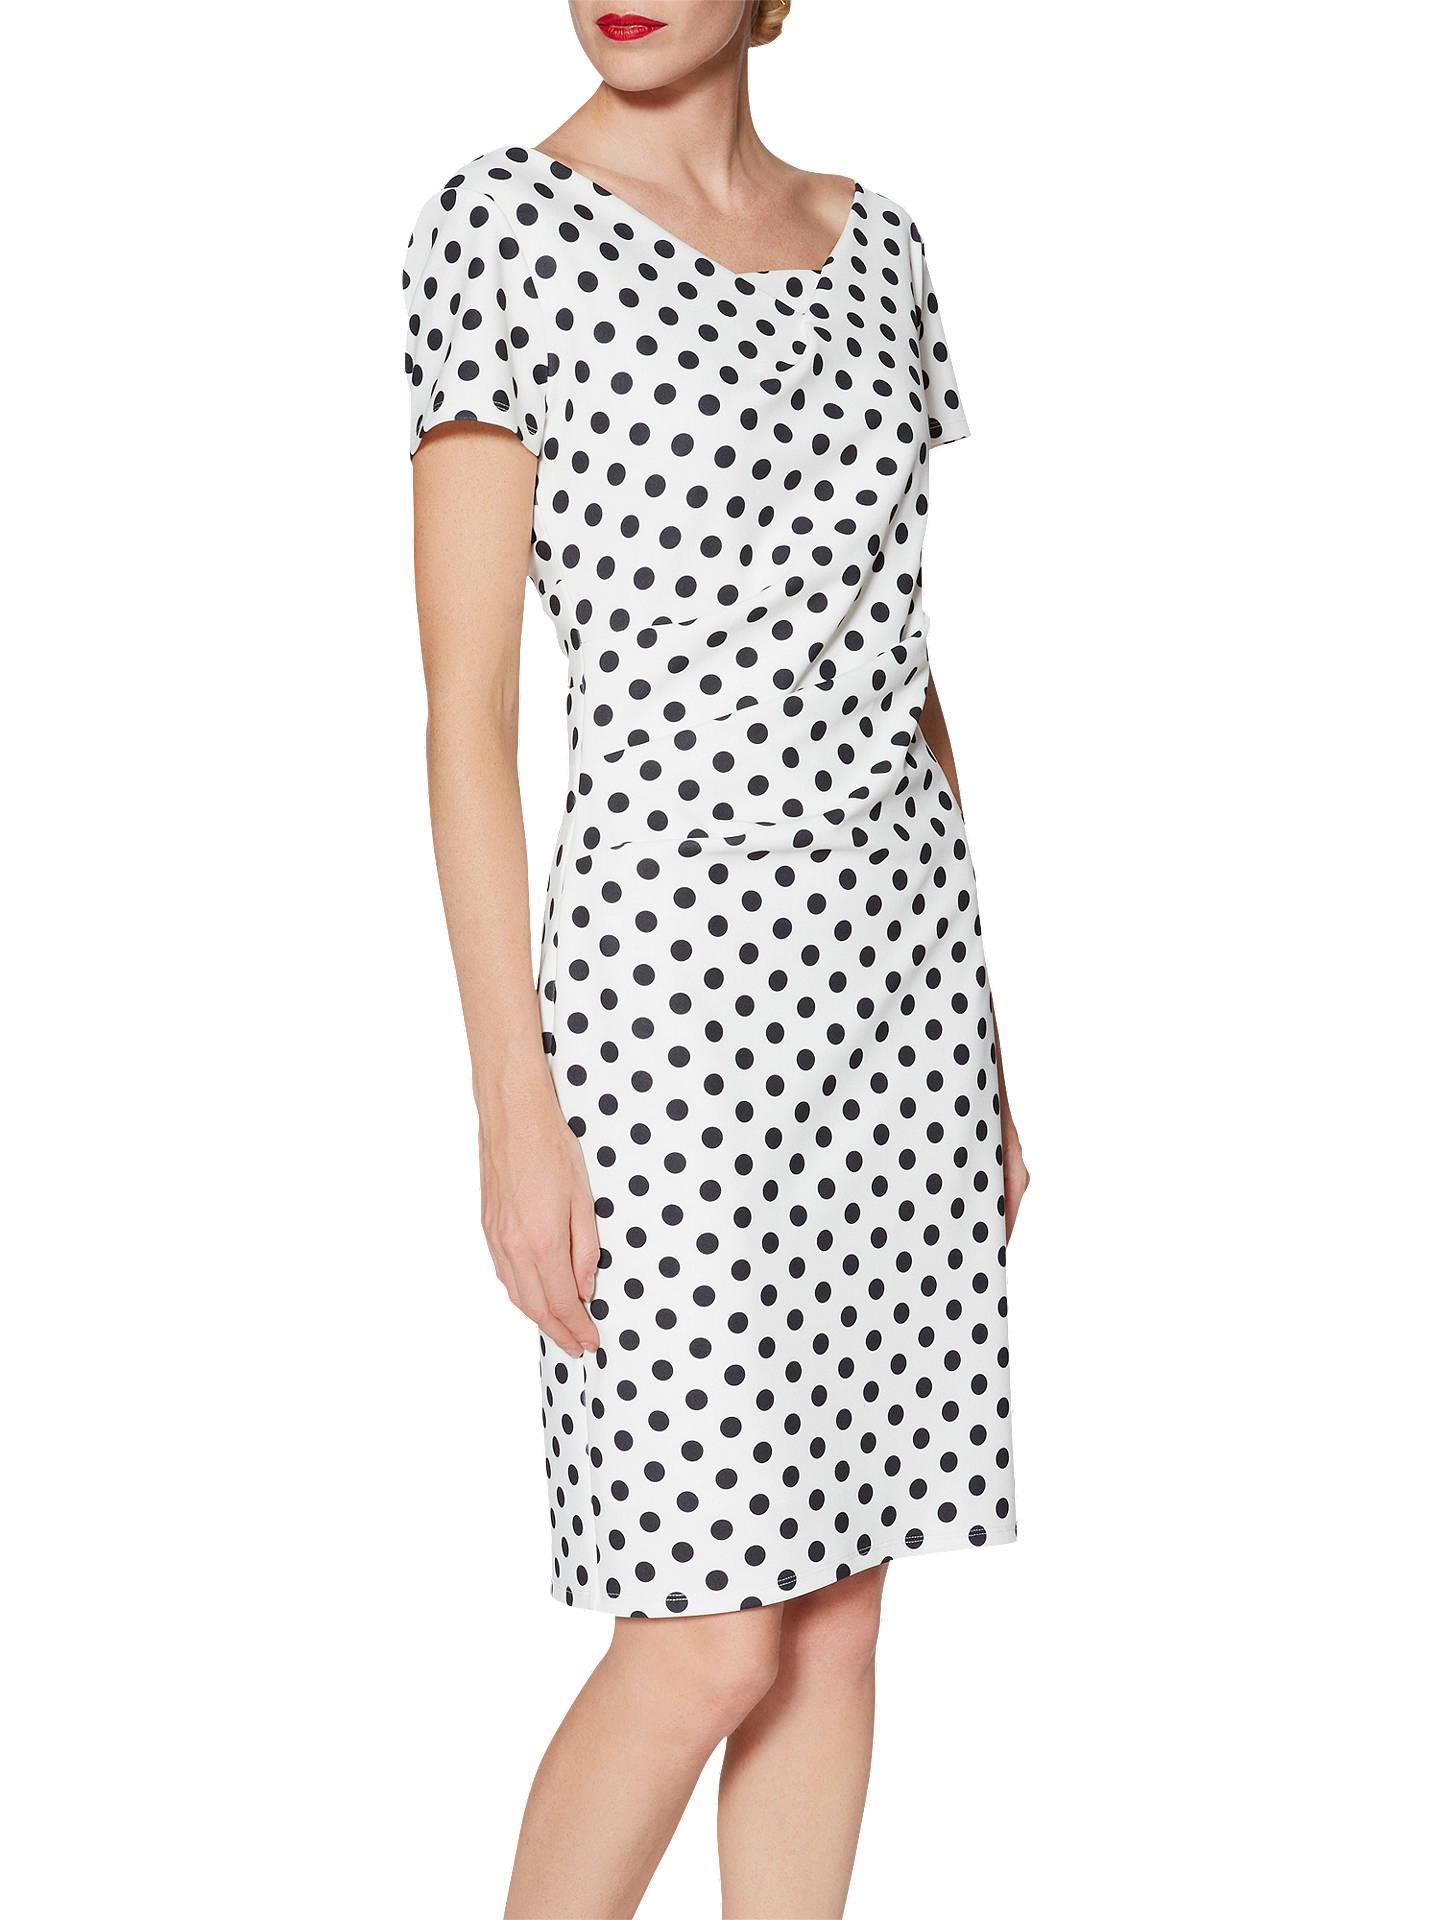 c08b909c0f7 ... Buy Gina Bacconi Barbara Spotted Crepe Dress